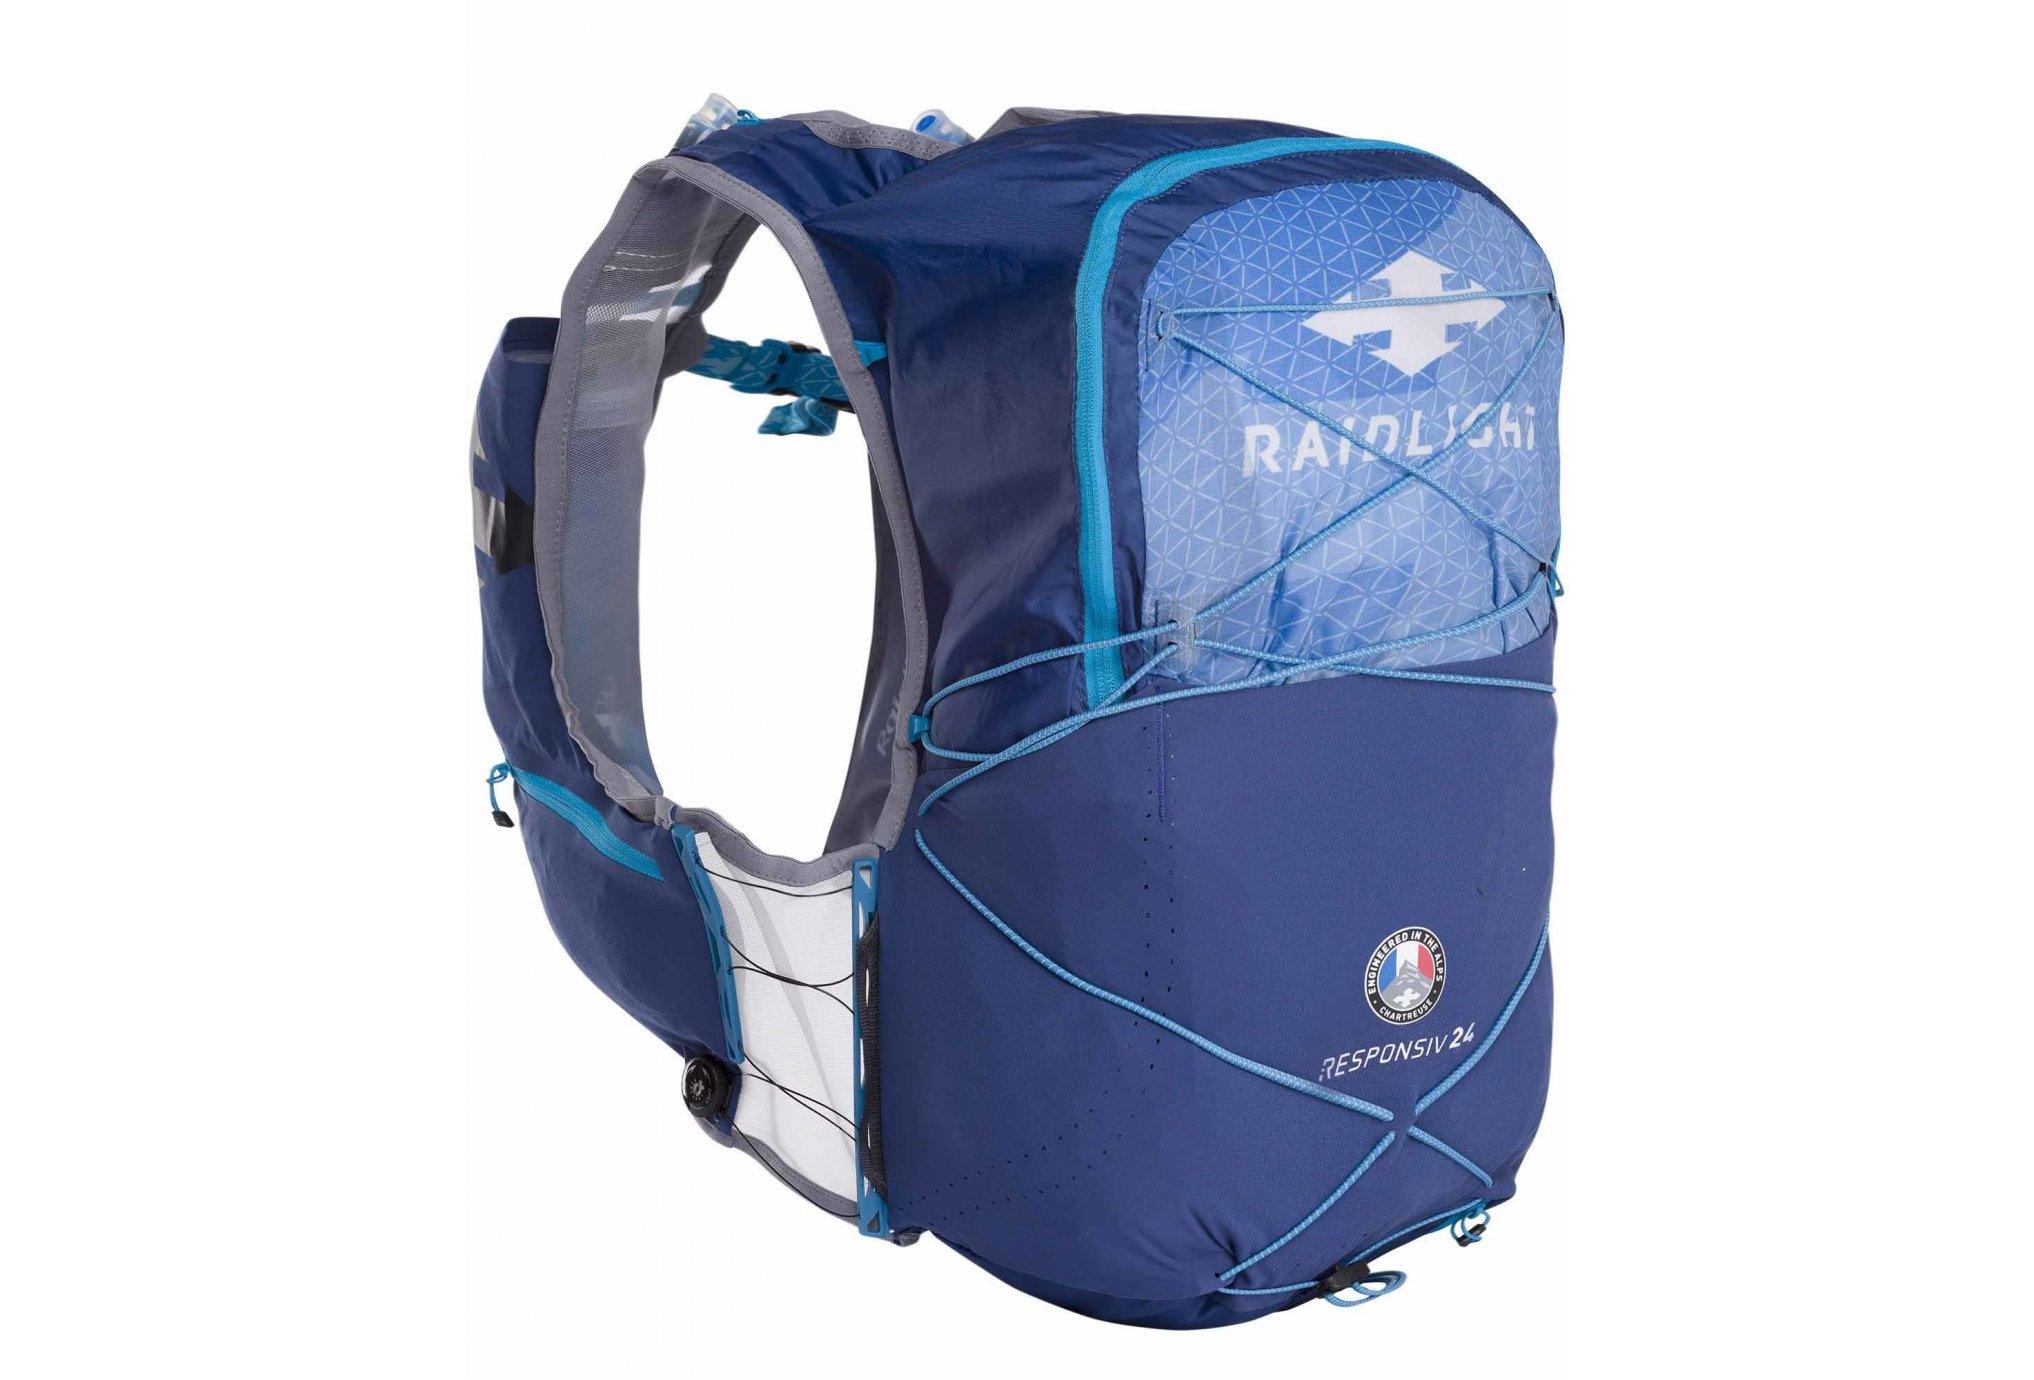 Raidlight Responsiv Vest 24L + 2 EazyFlask 600 mL M Sac hydratation / Gourde